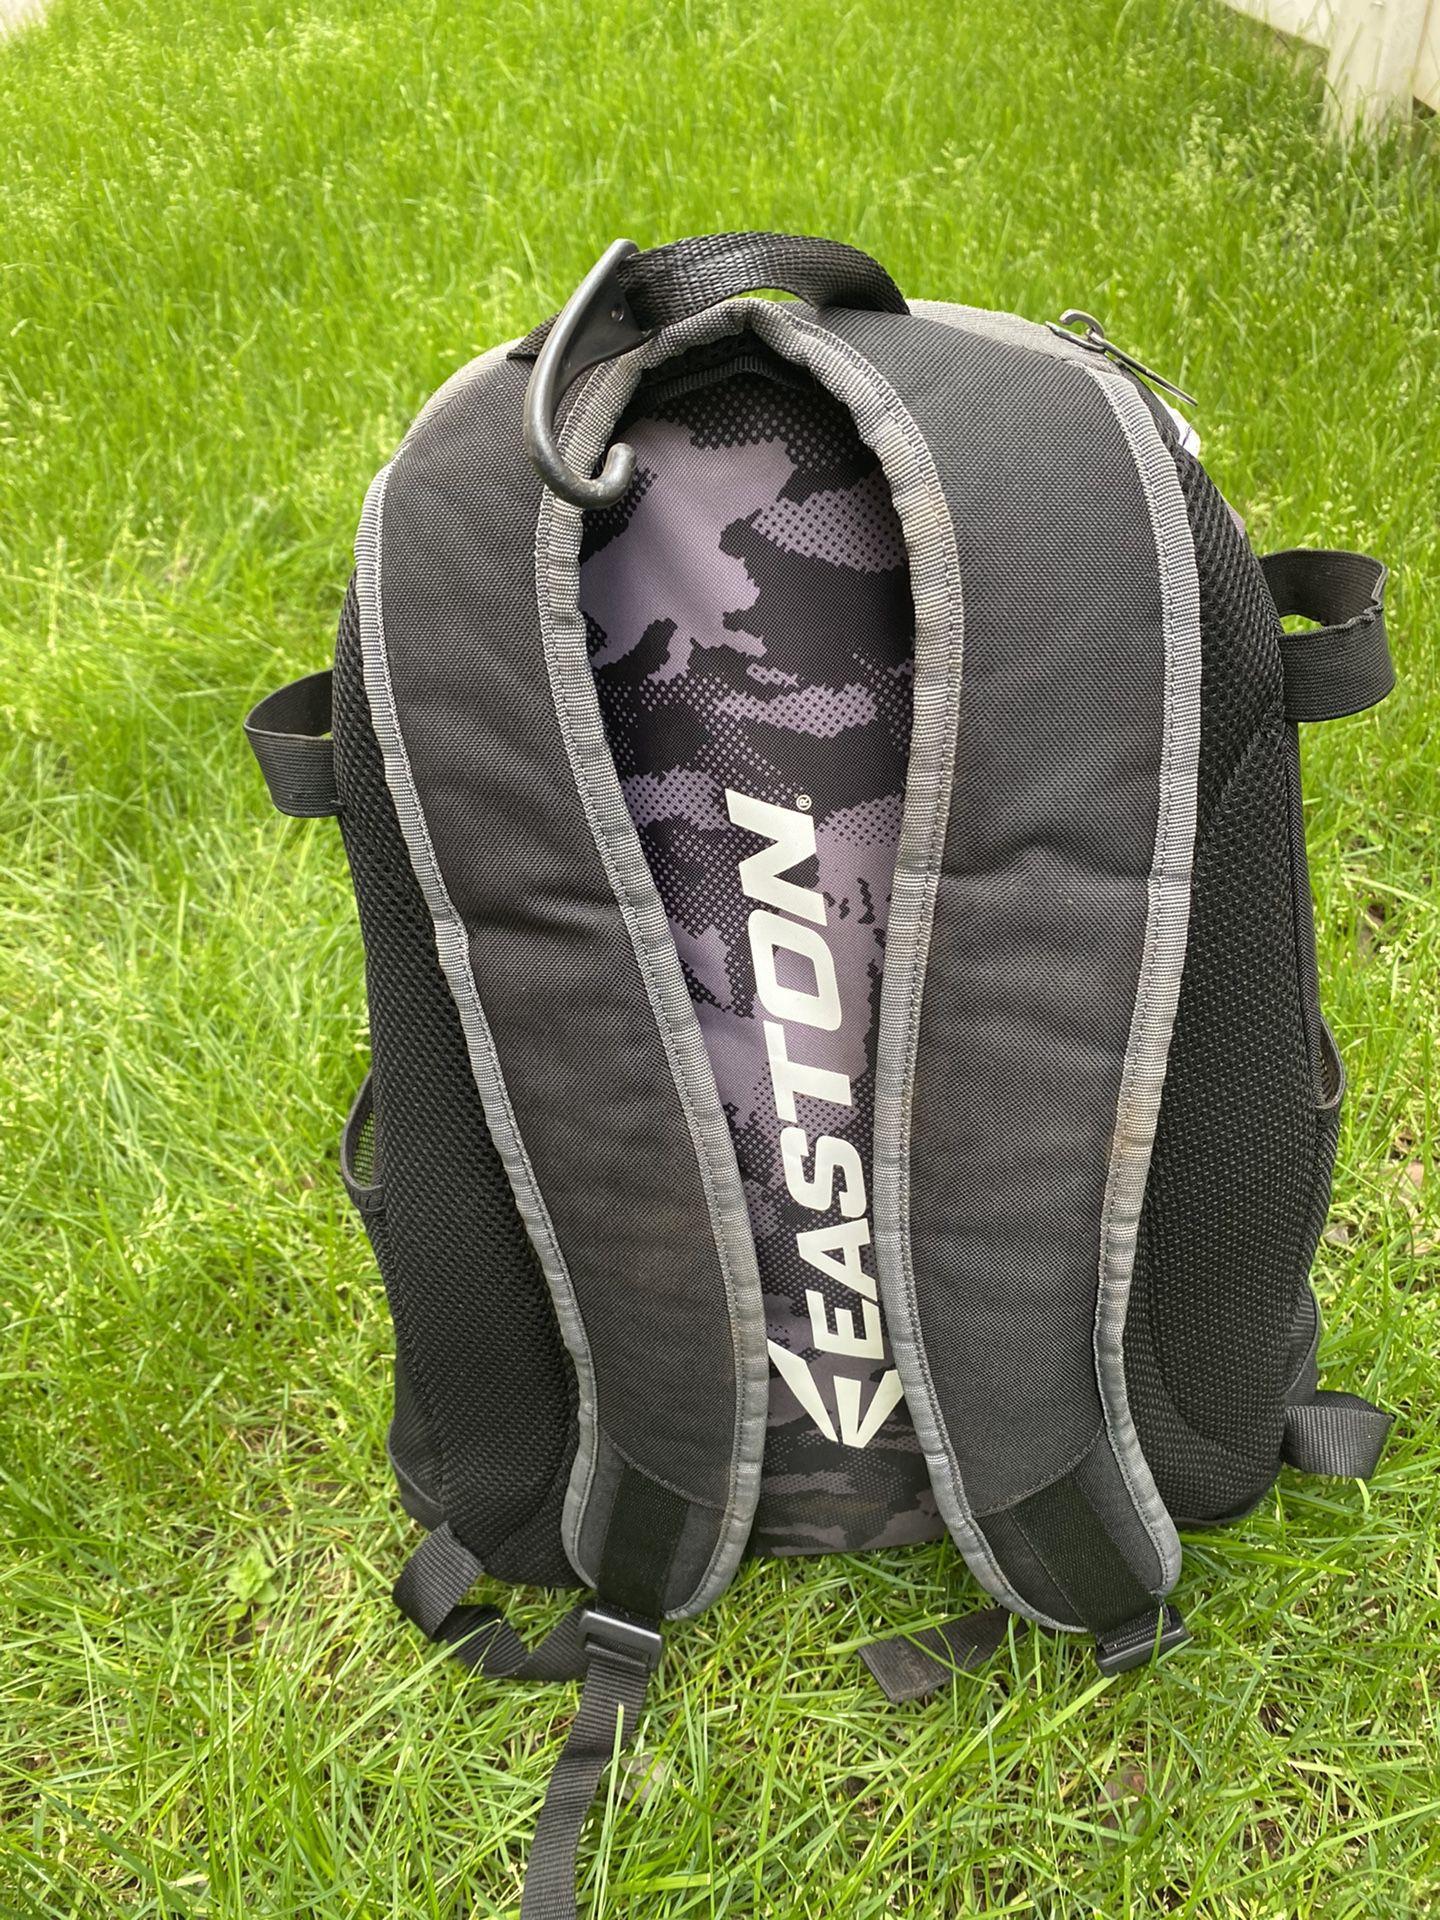 Baseball/Softball Backpack